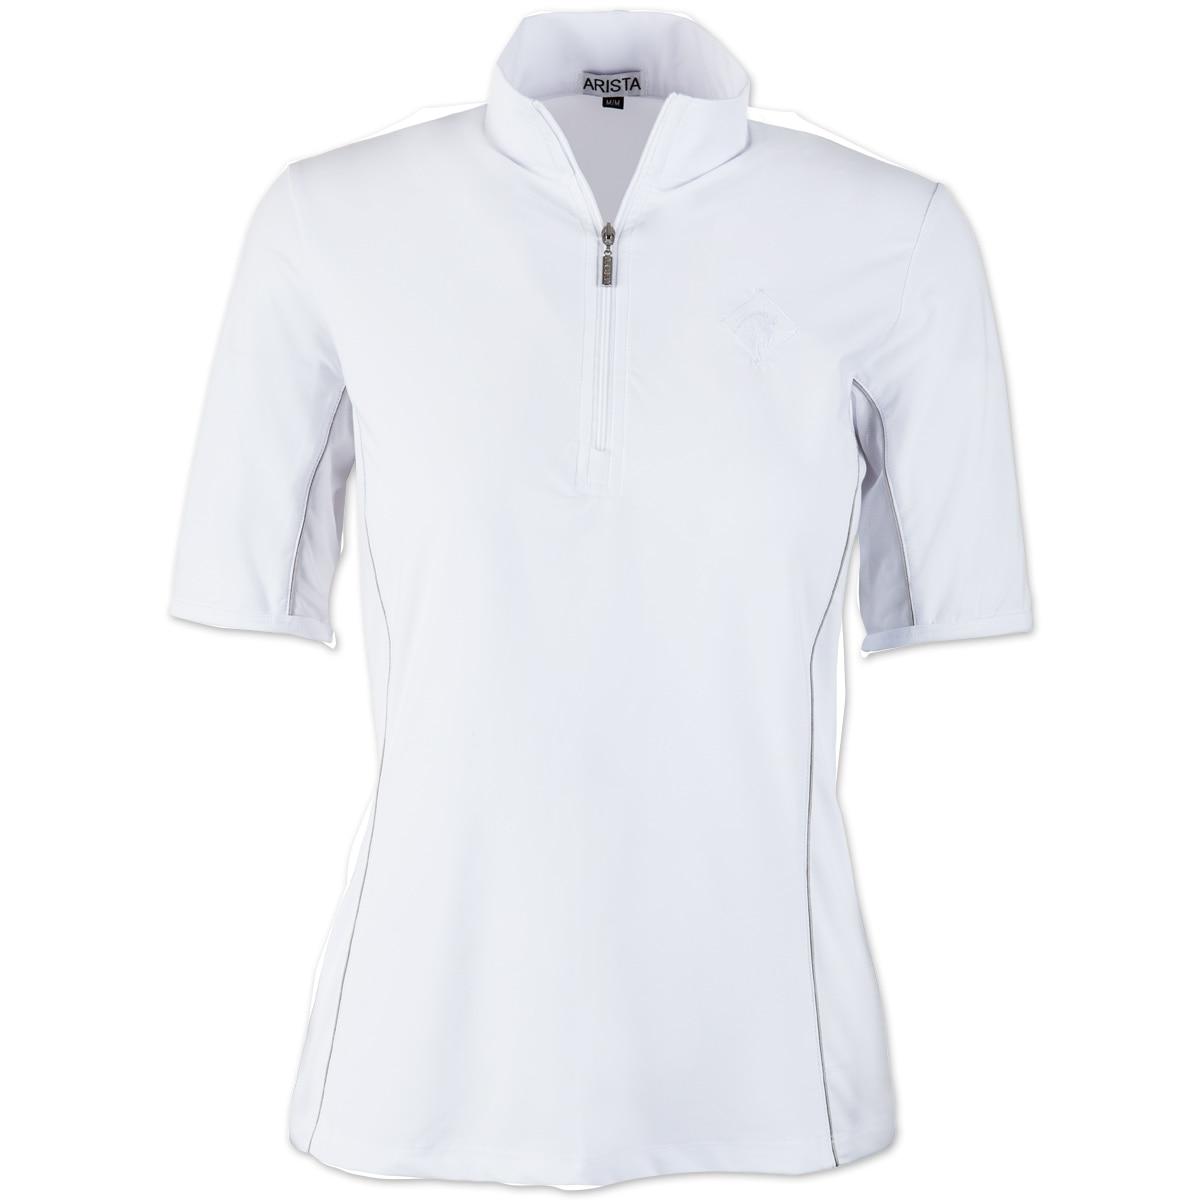 Arista Half Sleeve 1/4 Zip Sun Shirt